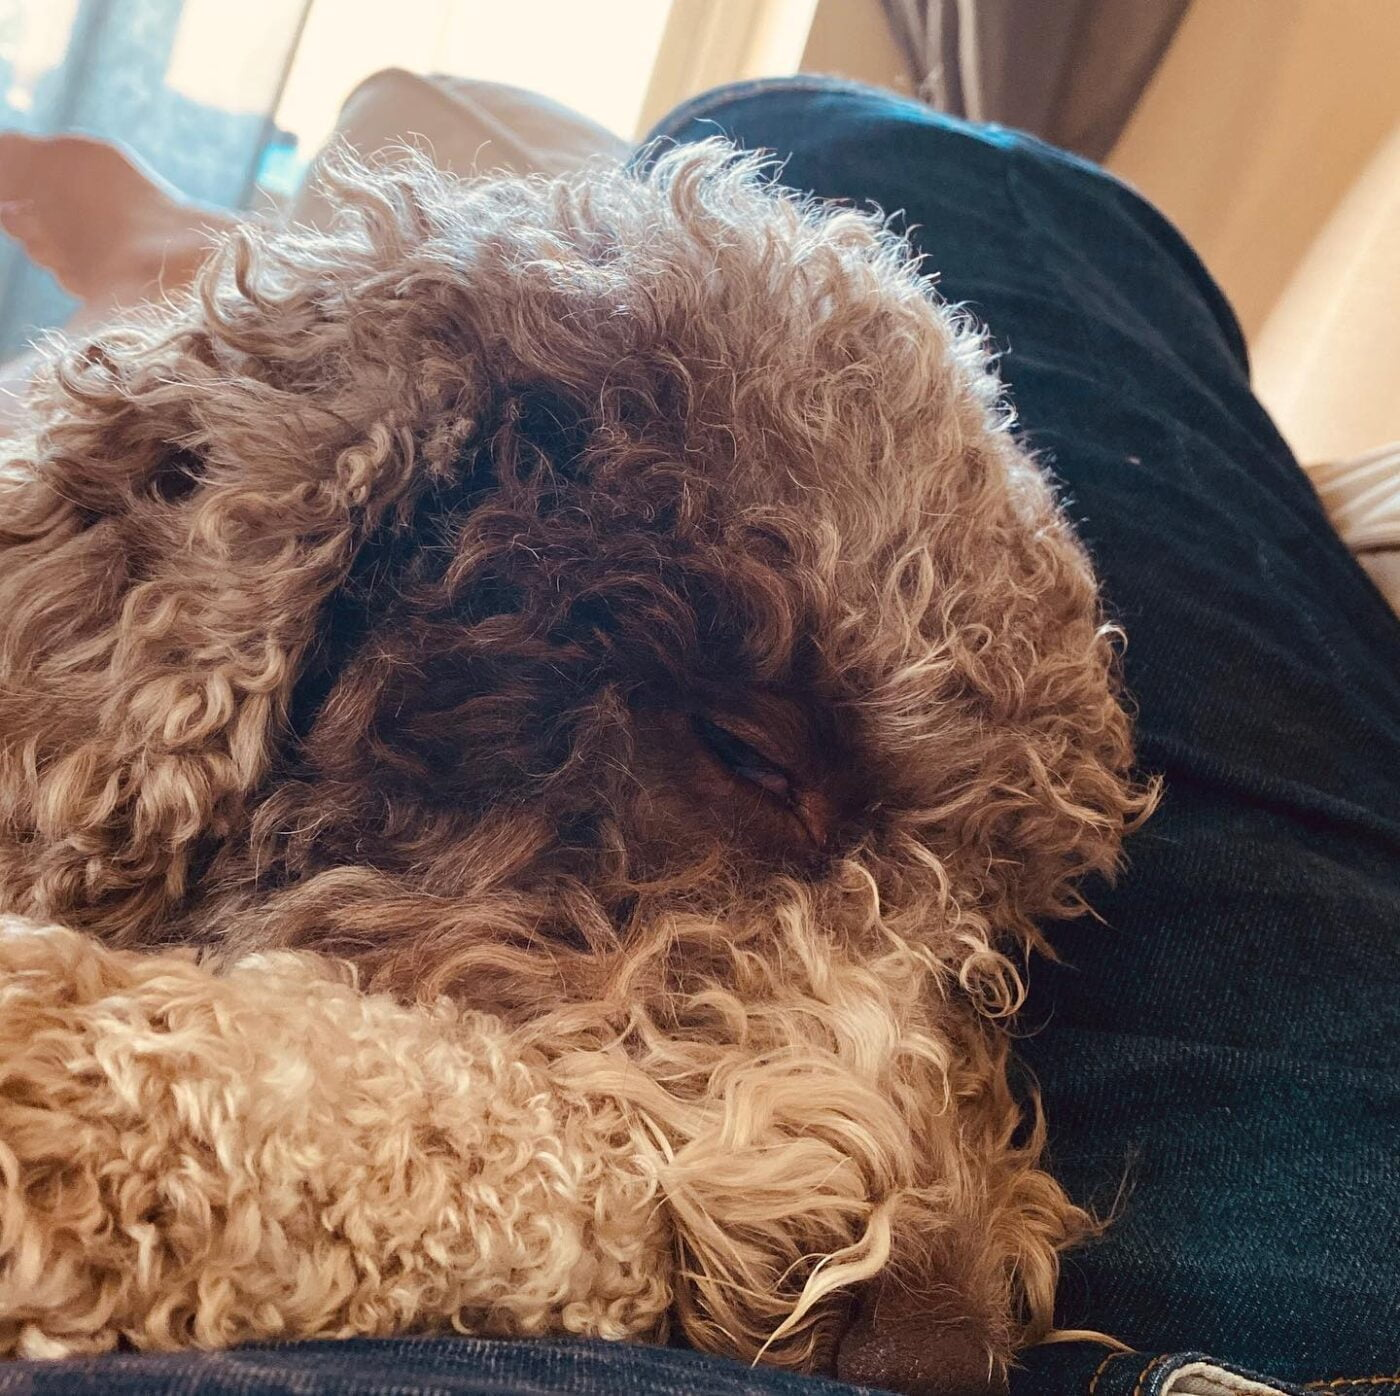 I fell asleep on Dad. Just like that. #lagottosofinstagram #lagottopuppy #italianwaterdog #truffledog #lagottoromagnolo_daily #happydoglife #Lagotto #Dogs #DogsOfInstagram #Petstagram #Pets #Dogstagram #MyLife #MyDailyLife #PappaJagVillHaEnItalienare #MacLagotto #Falun #Sweden #FF #l4l #instafollow @knappare @liminglindblad @k.rowntree @taxen_coco @h3lvetesjavlar This was posted by my Dad: @kristerlindholmfalun